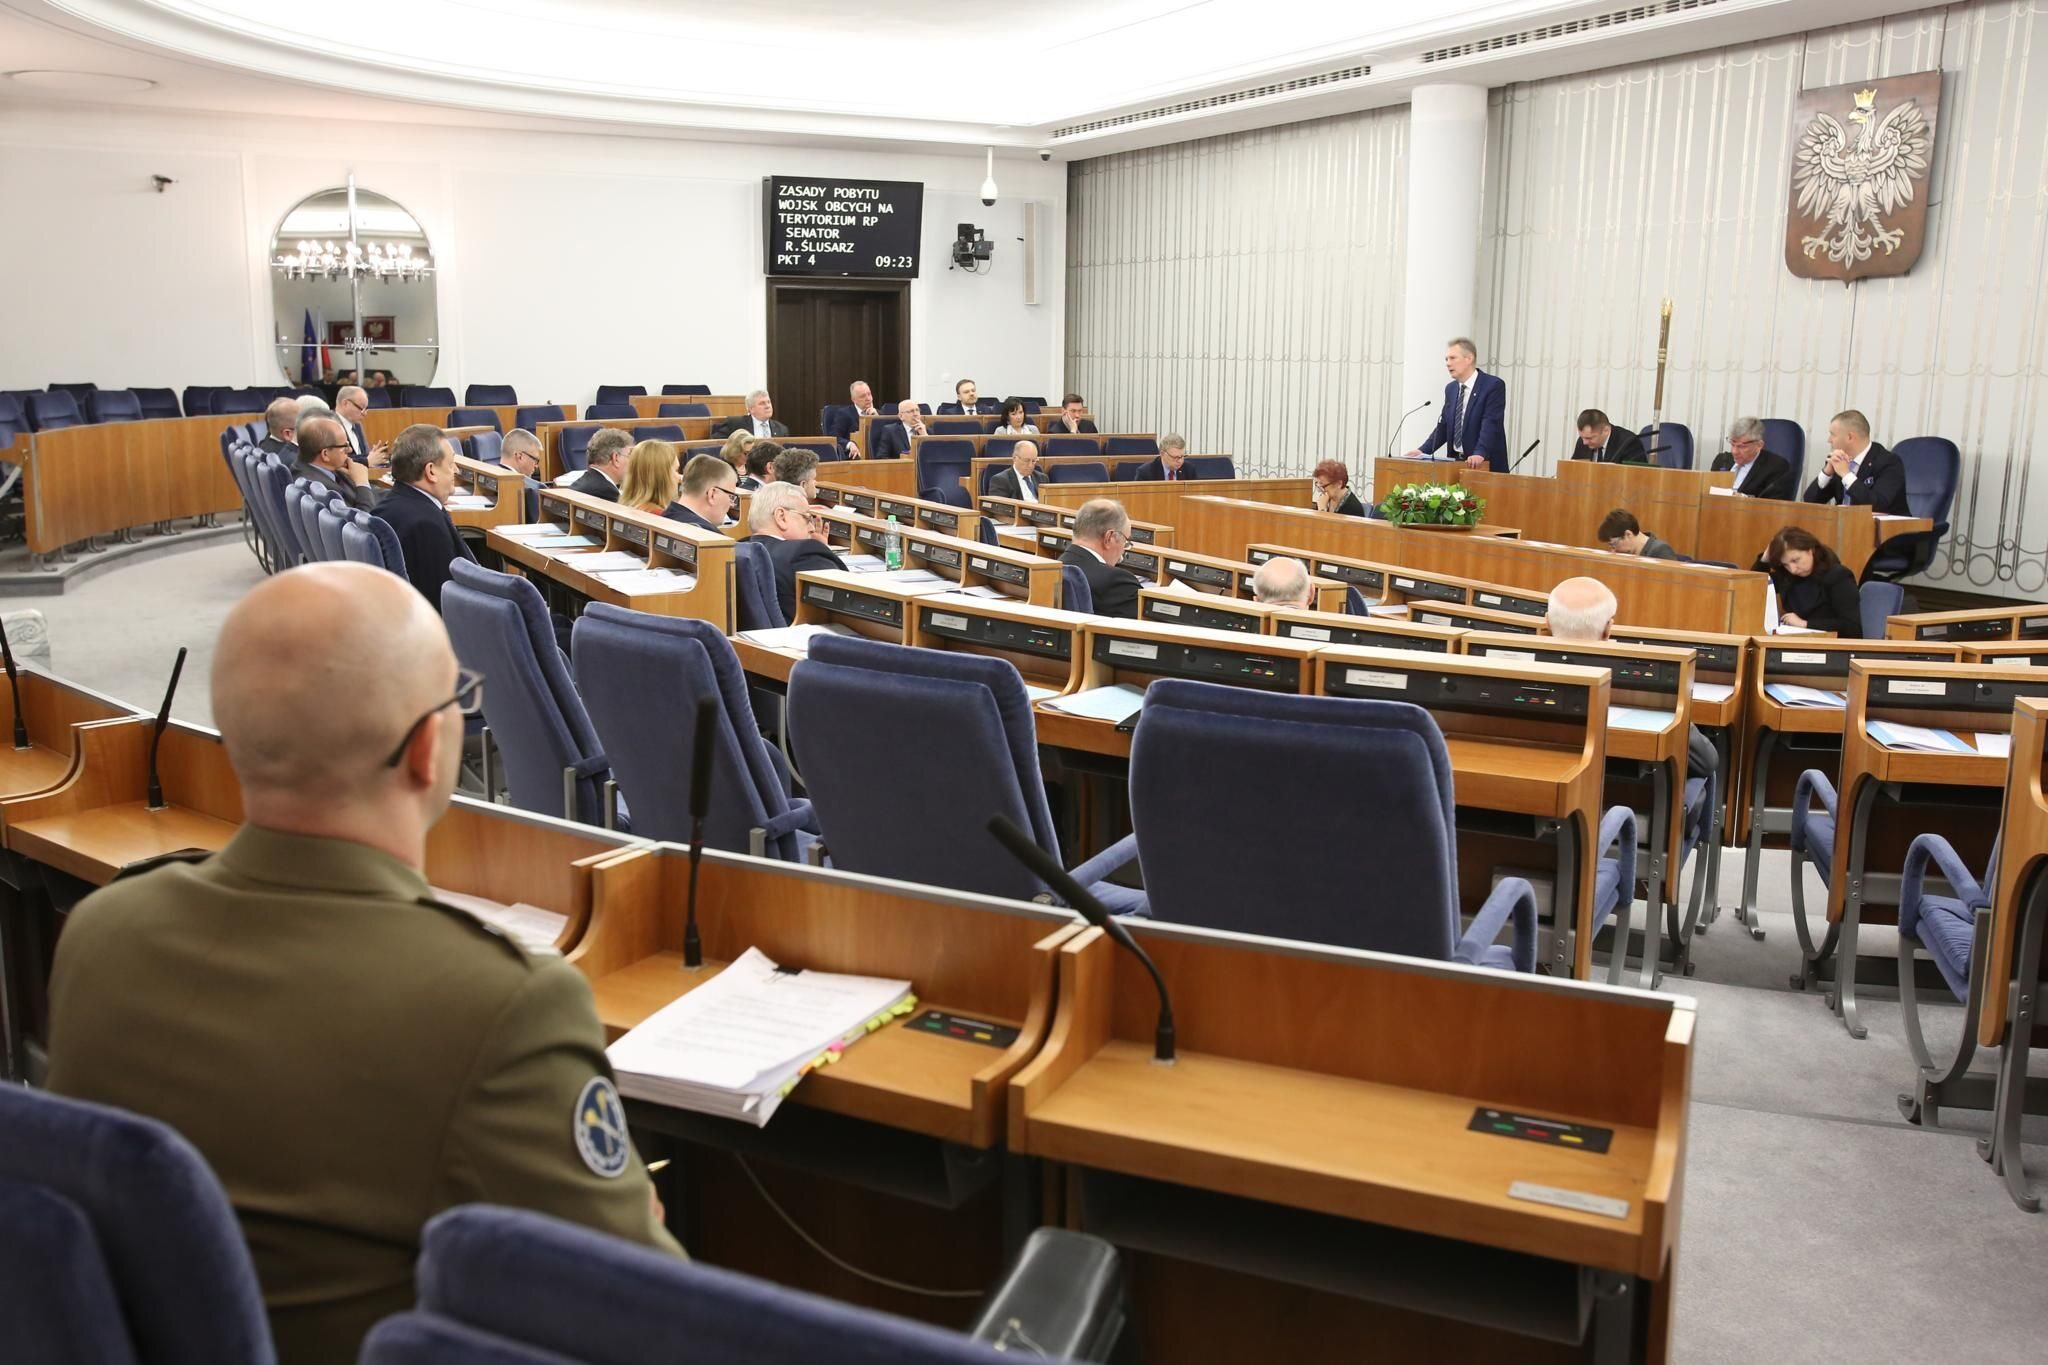 Sala obrad Senatu RP